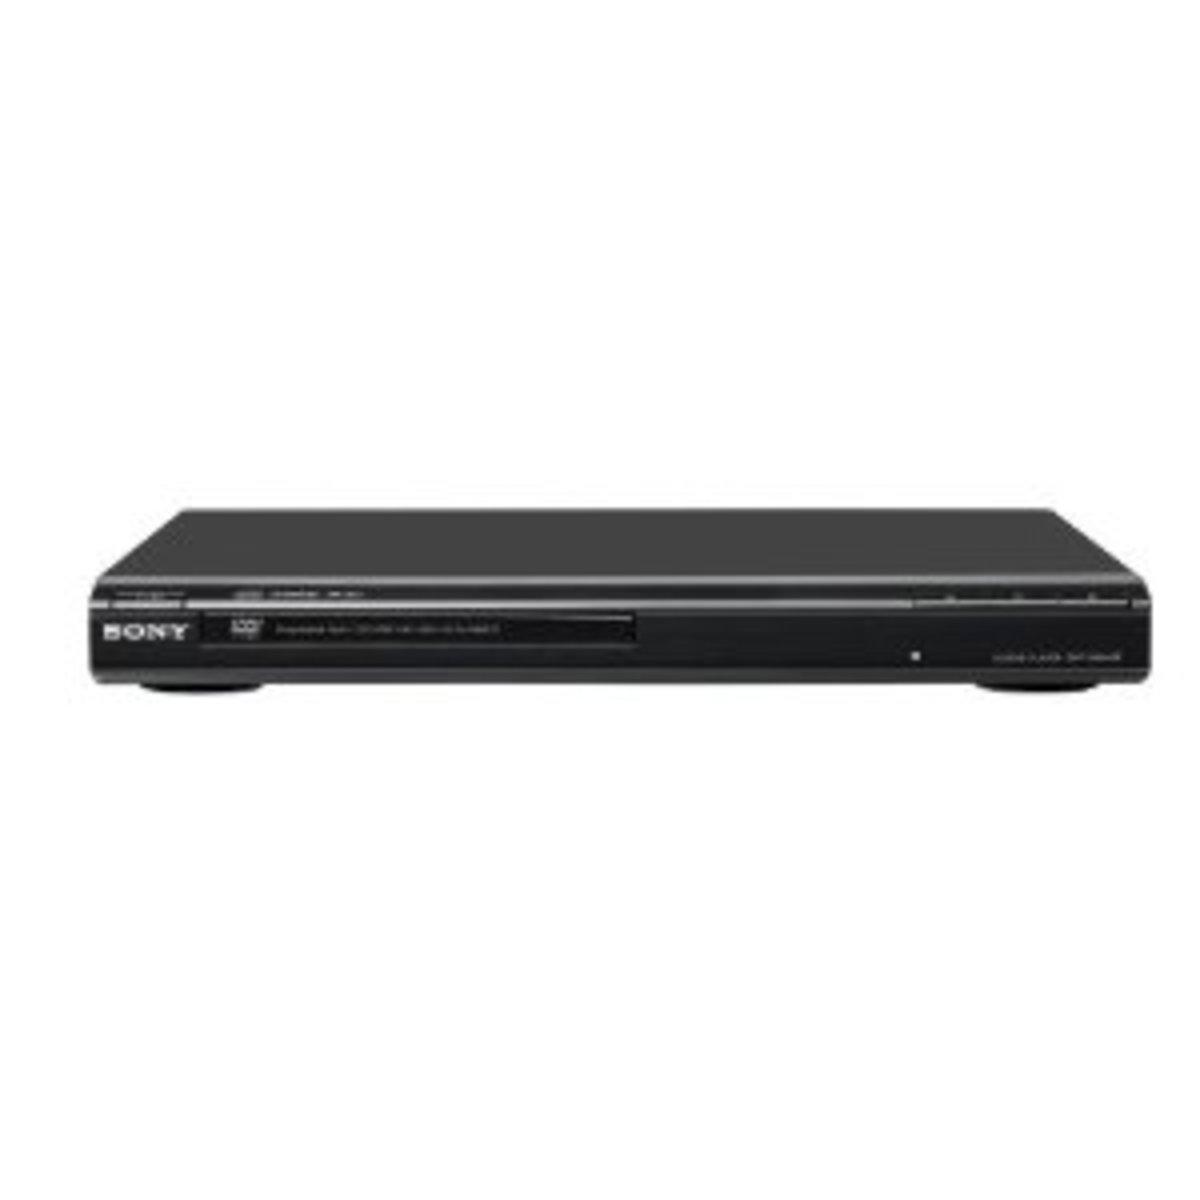 Sony DVP-SR200P CD/DVD Player Troubleshooting